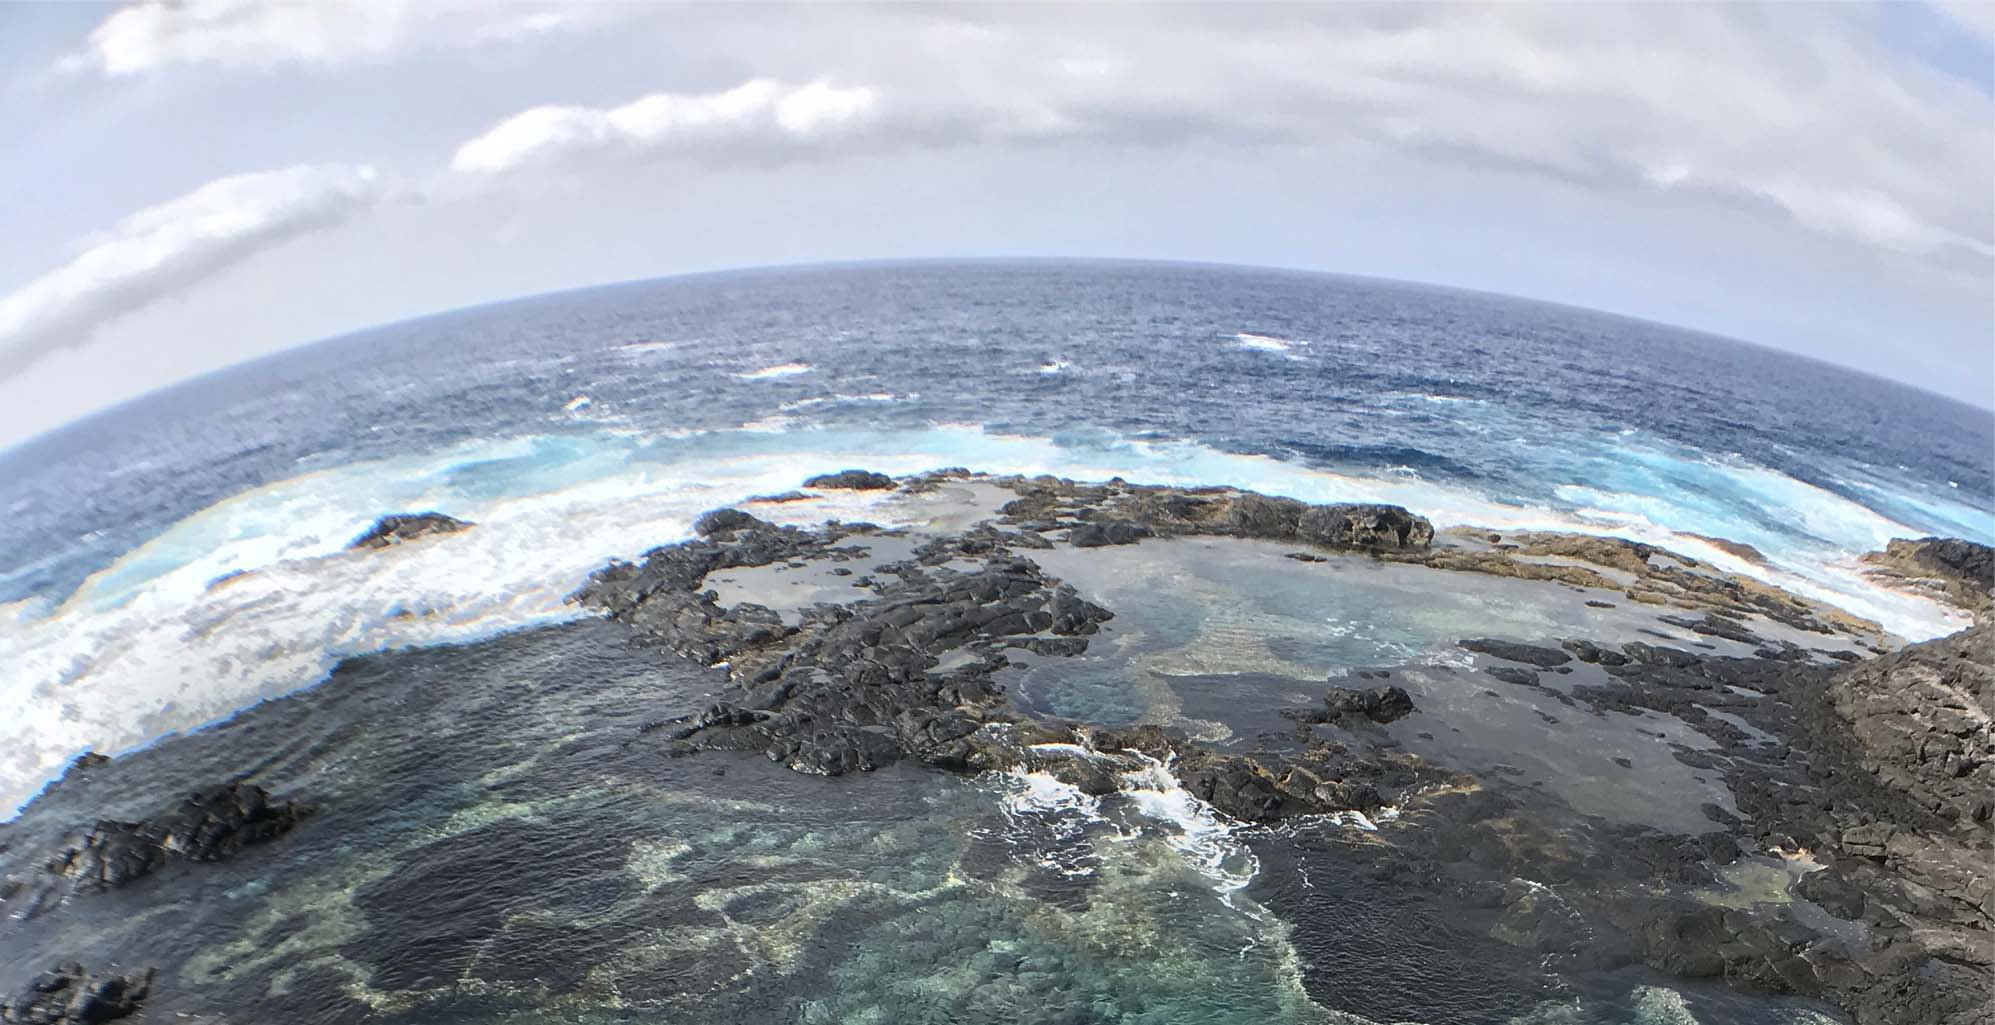 Fisheye lens of a rocky beach